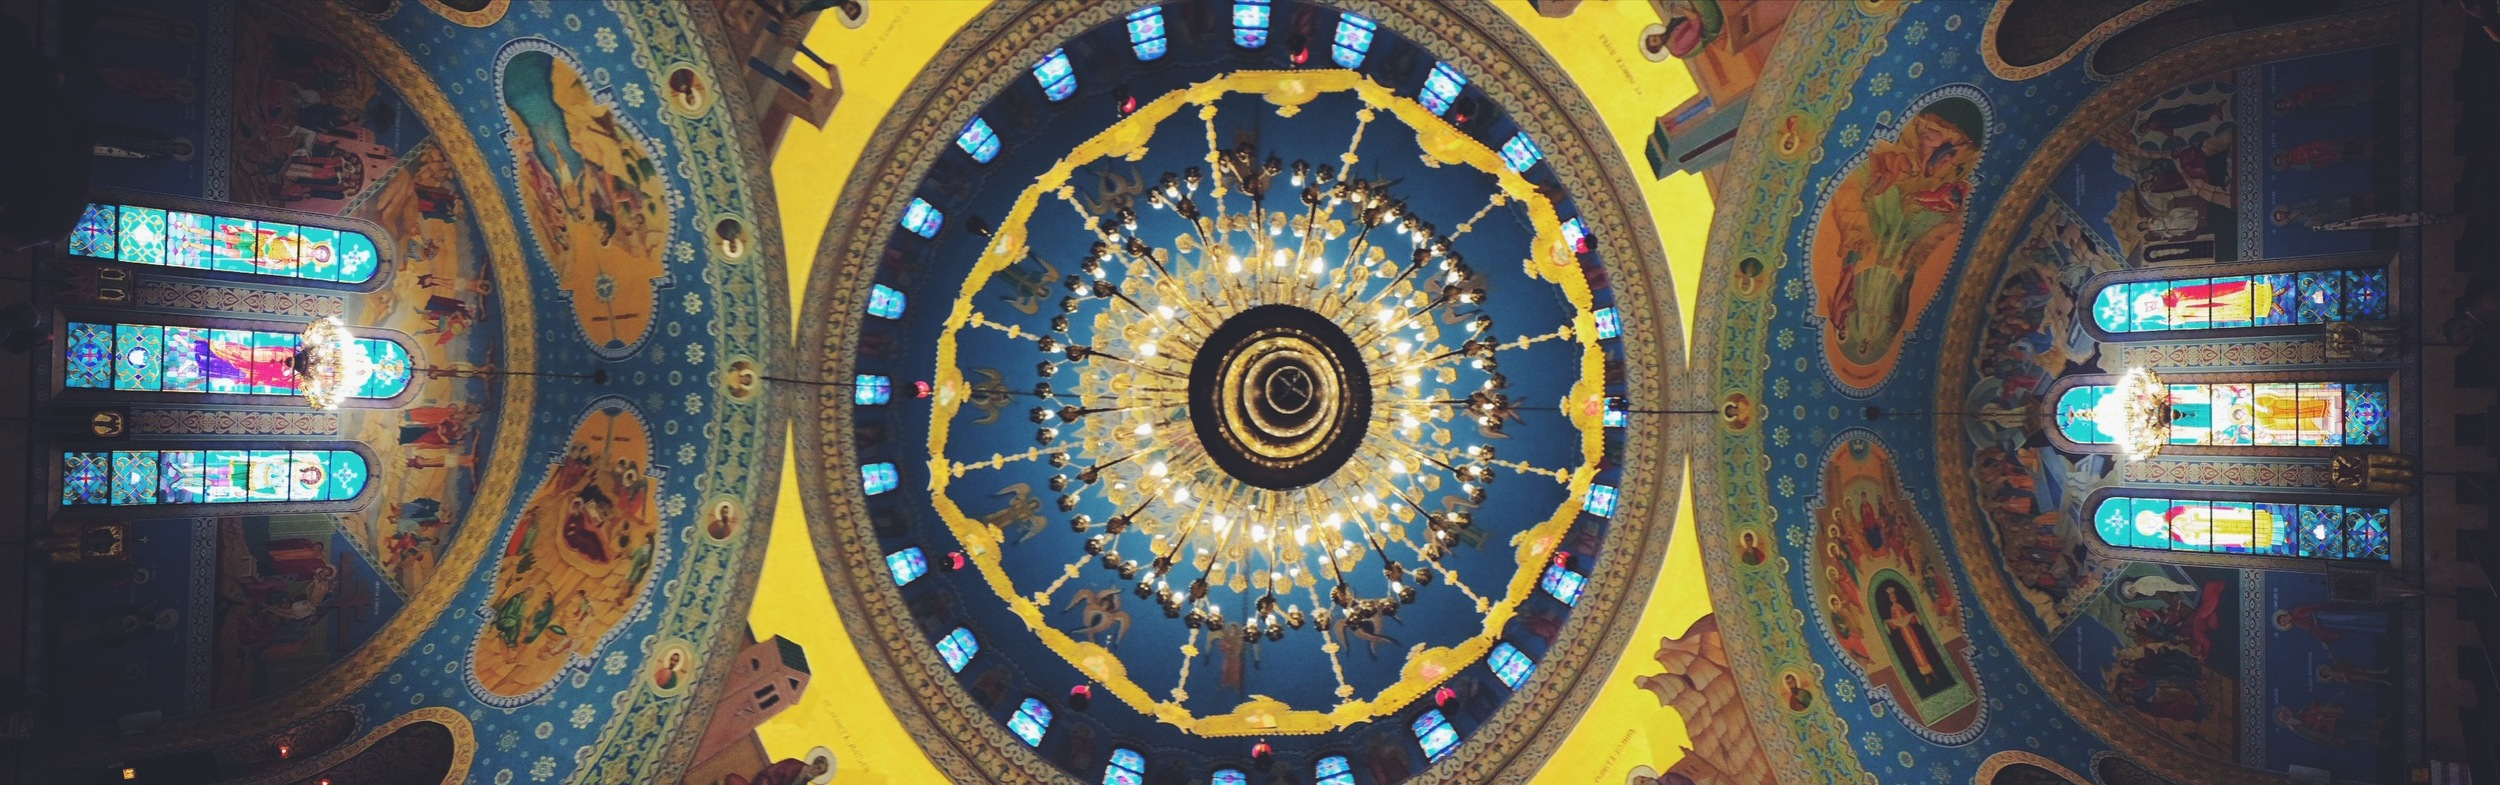 Sts. Volodymyr & Olha Ukrainian Catholic Church's Ceiling